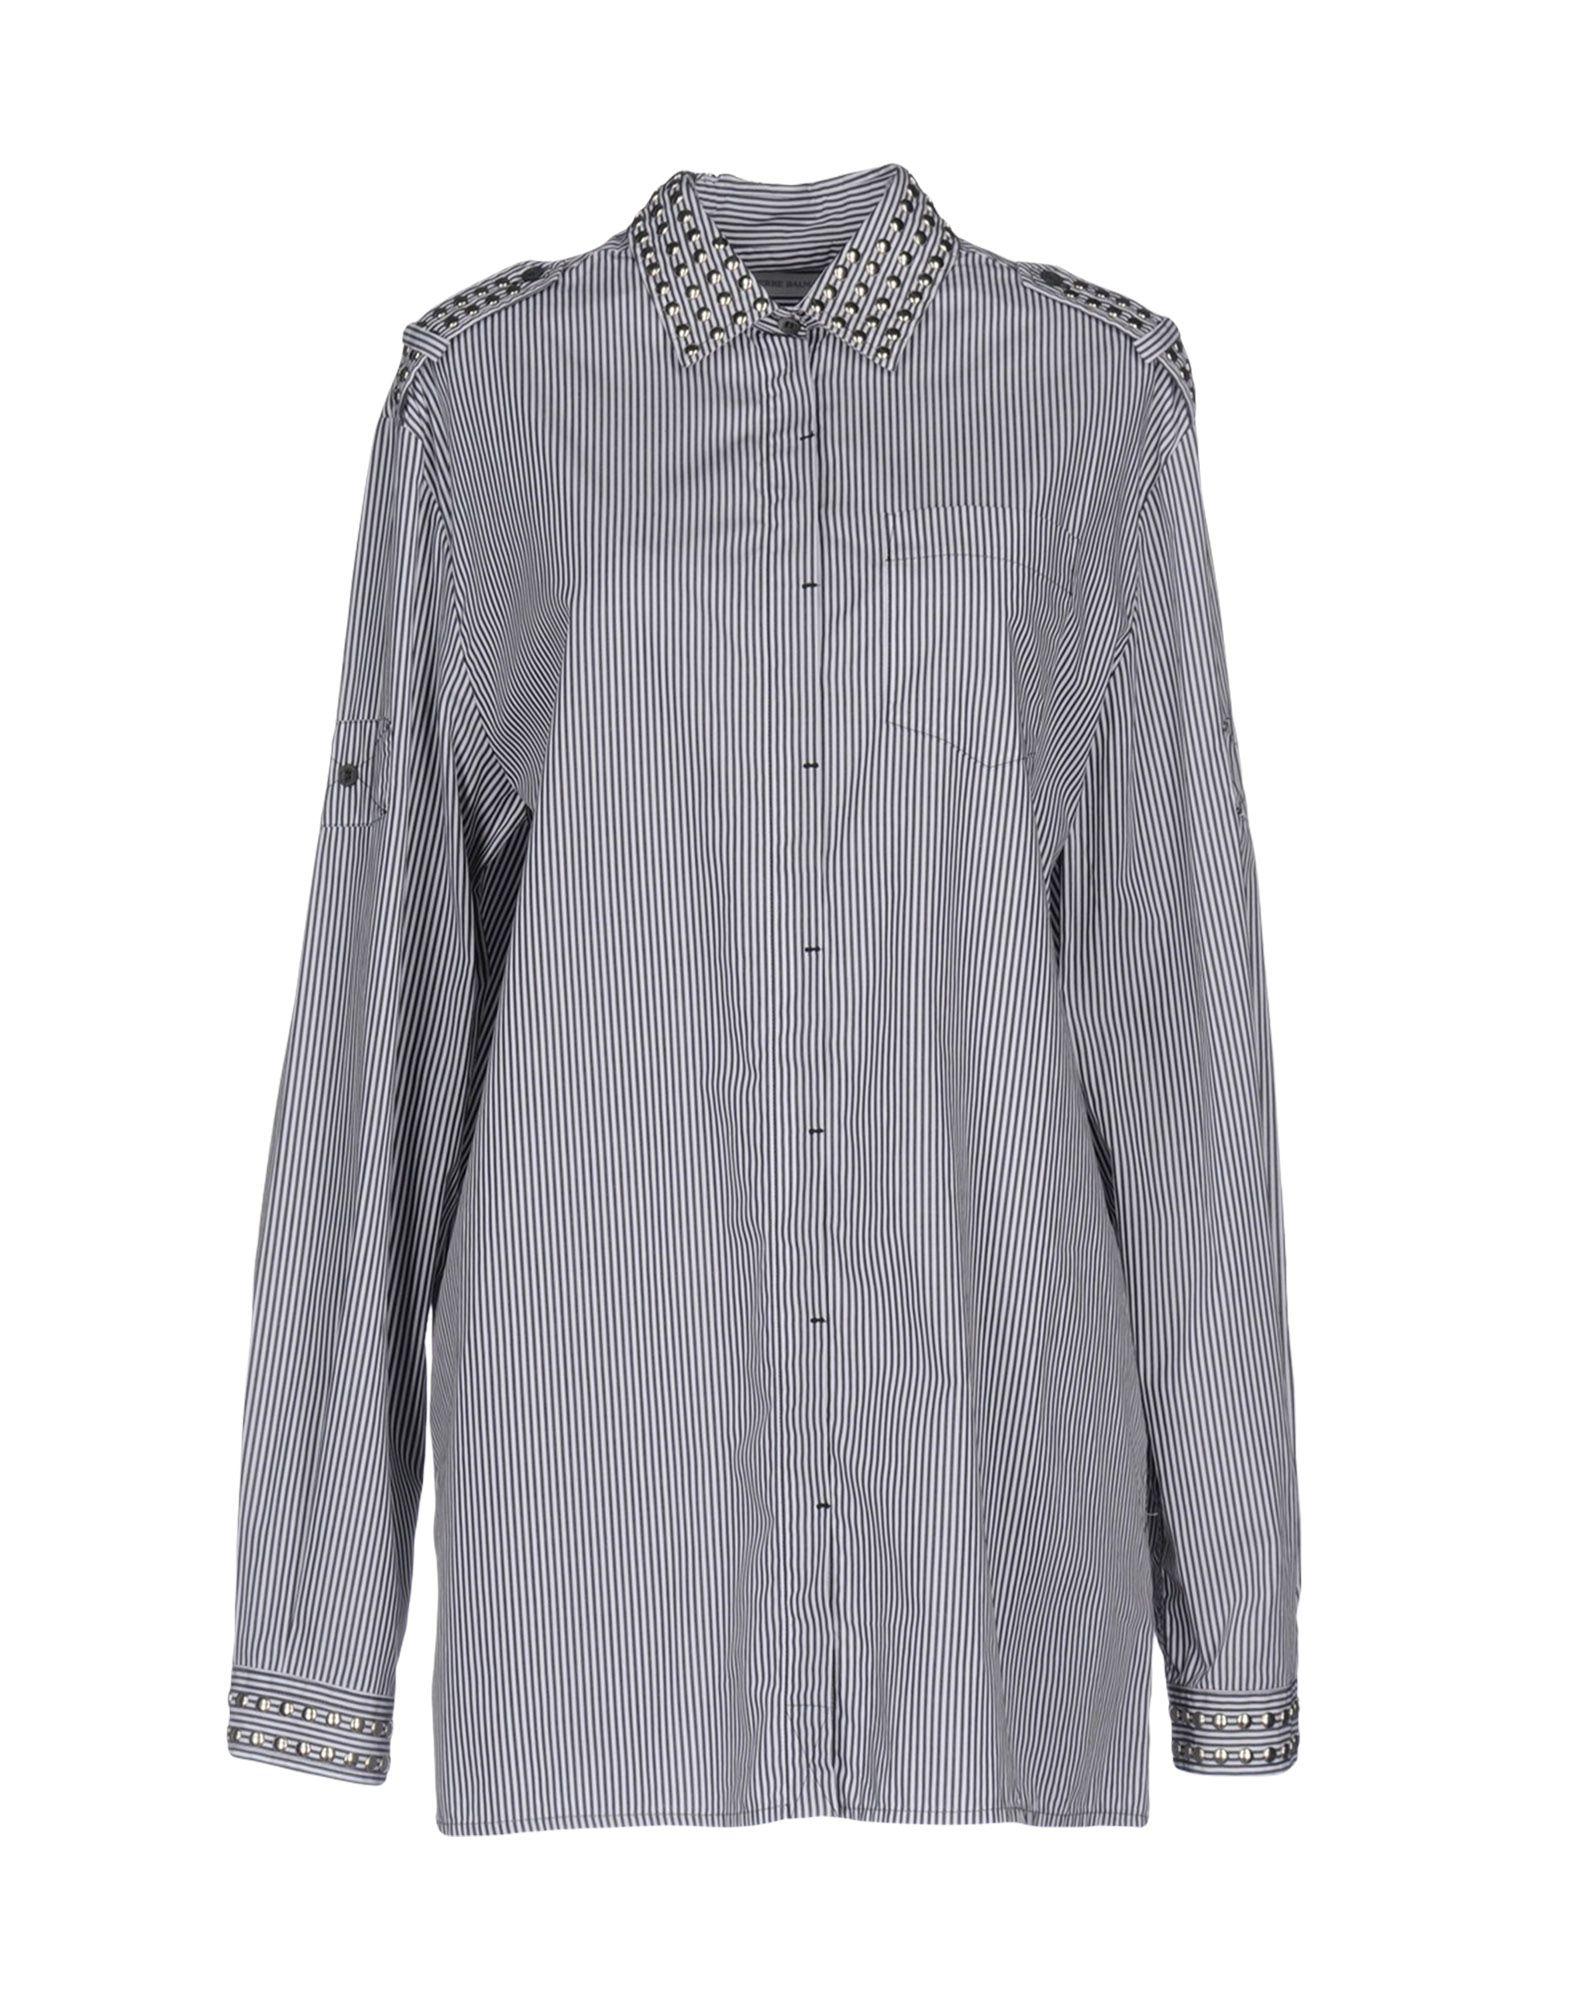 PIERRE BALMAIN Damen Hemd Farbe Schwarz Größe 6